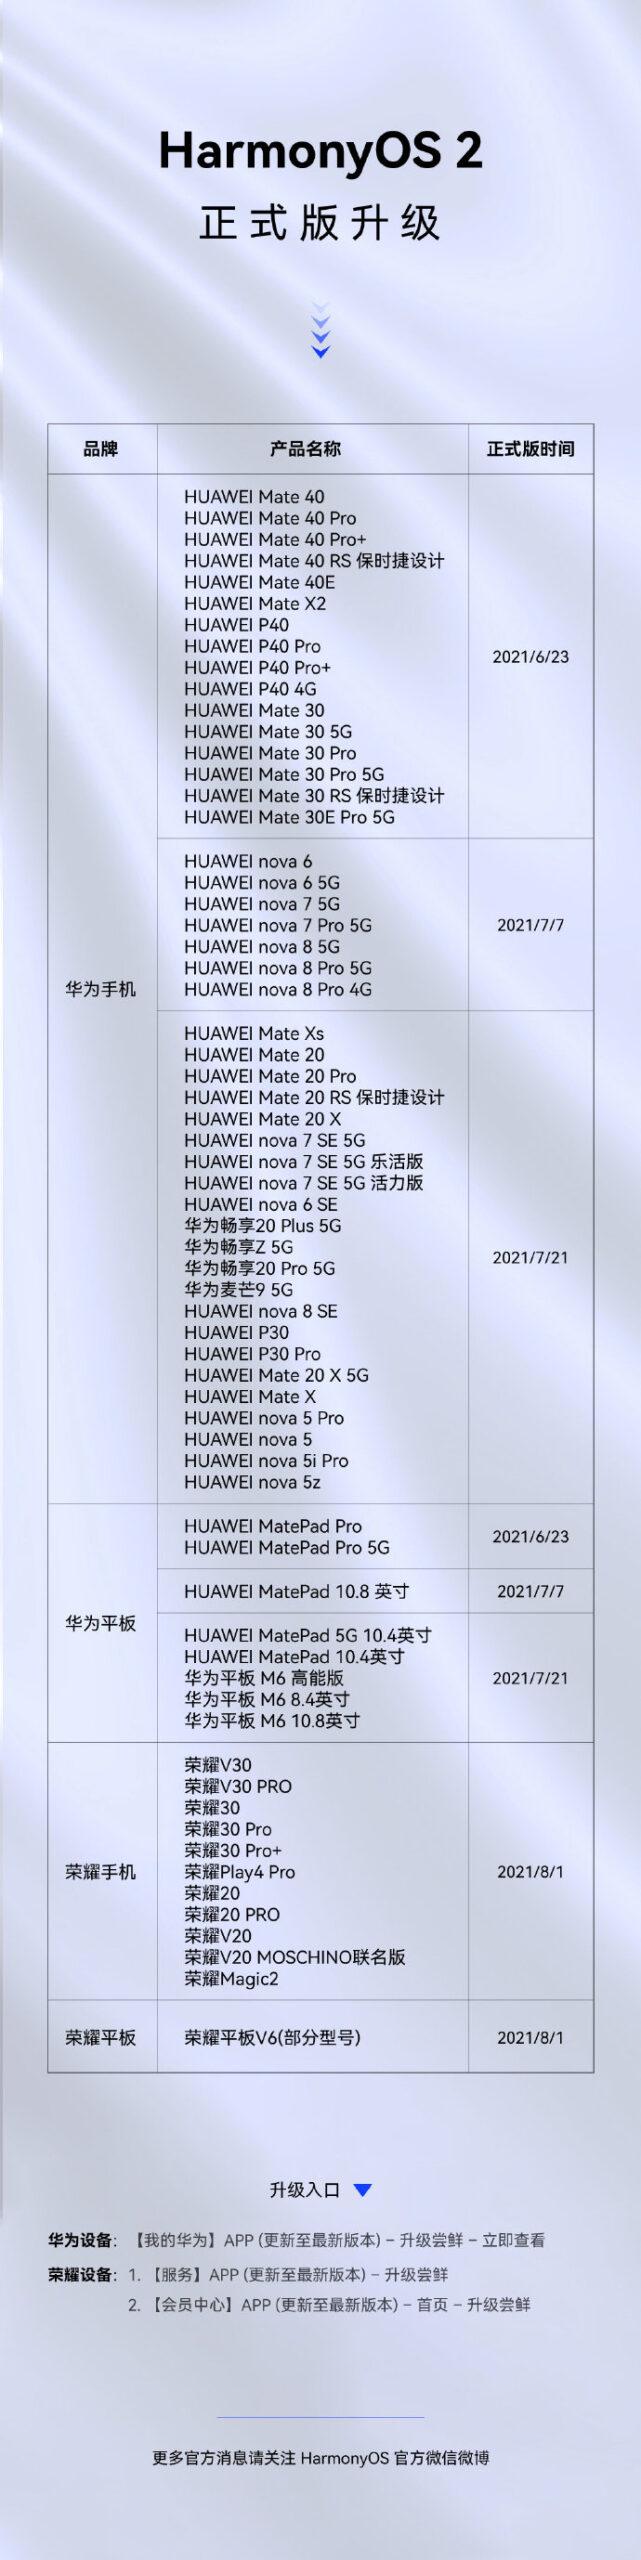 65 HarmonyOS stable devices